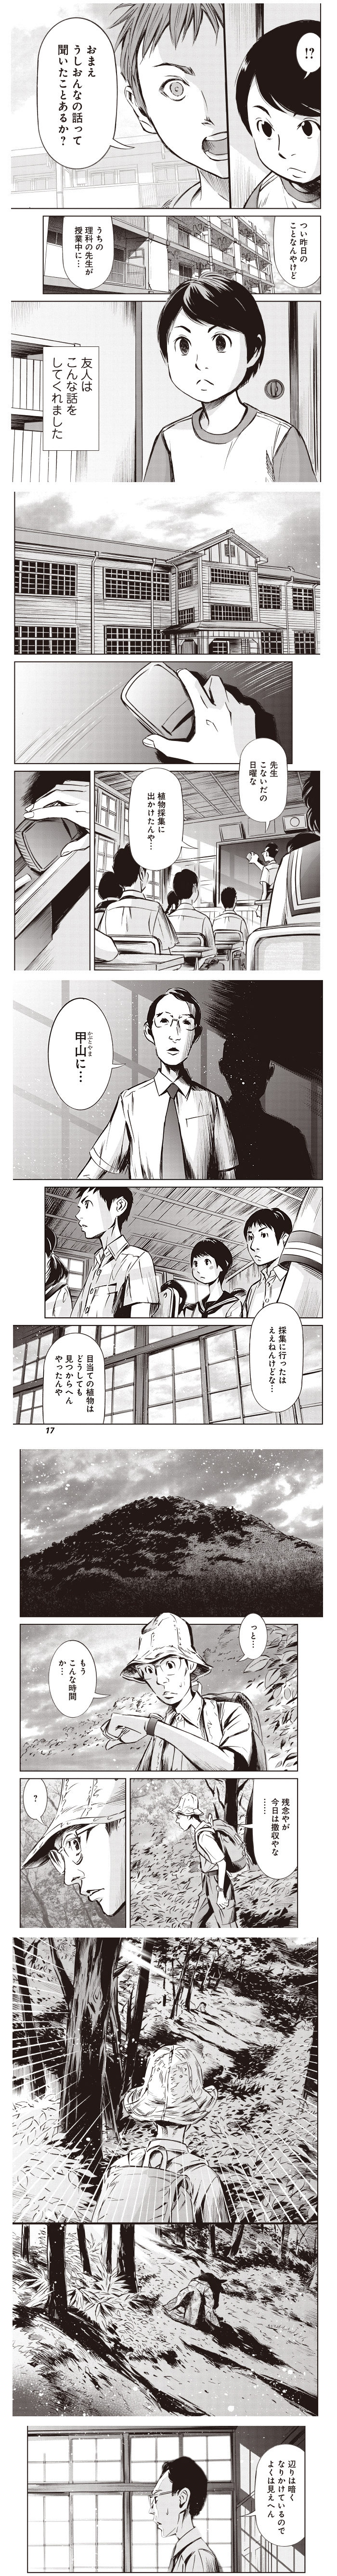 shinmimi5-3